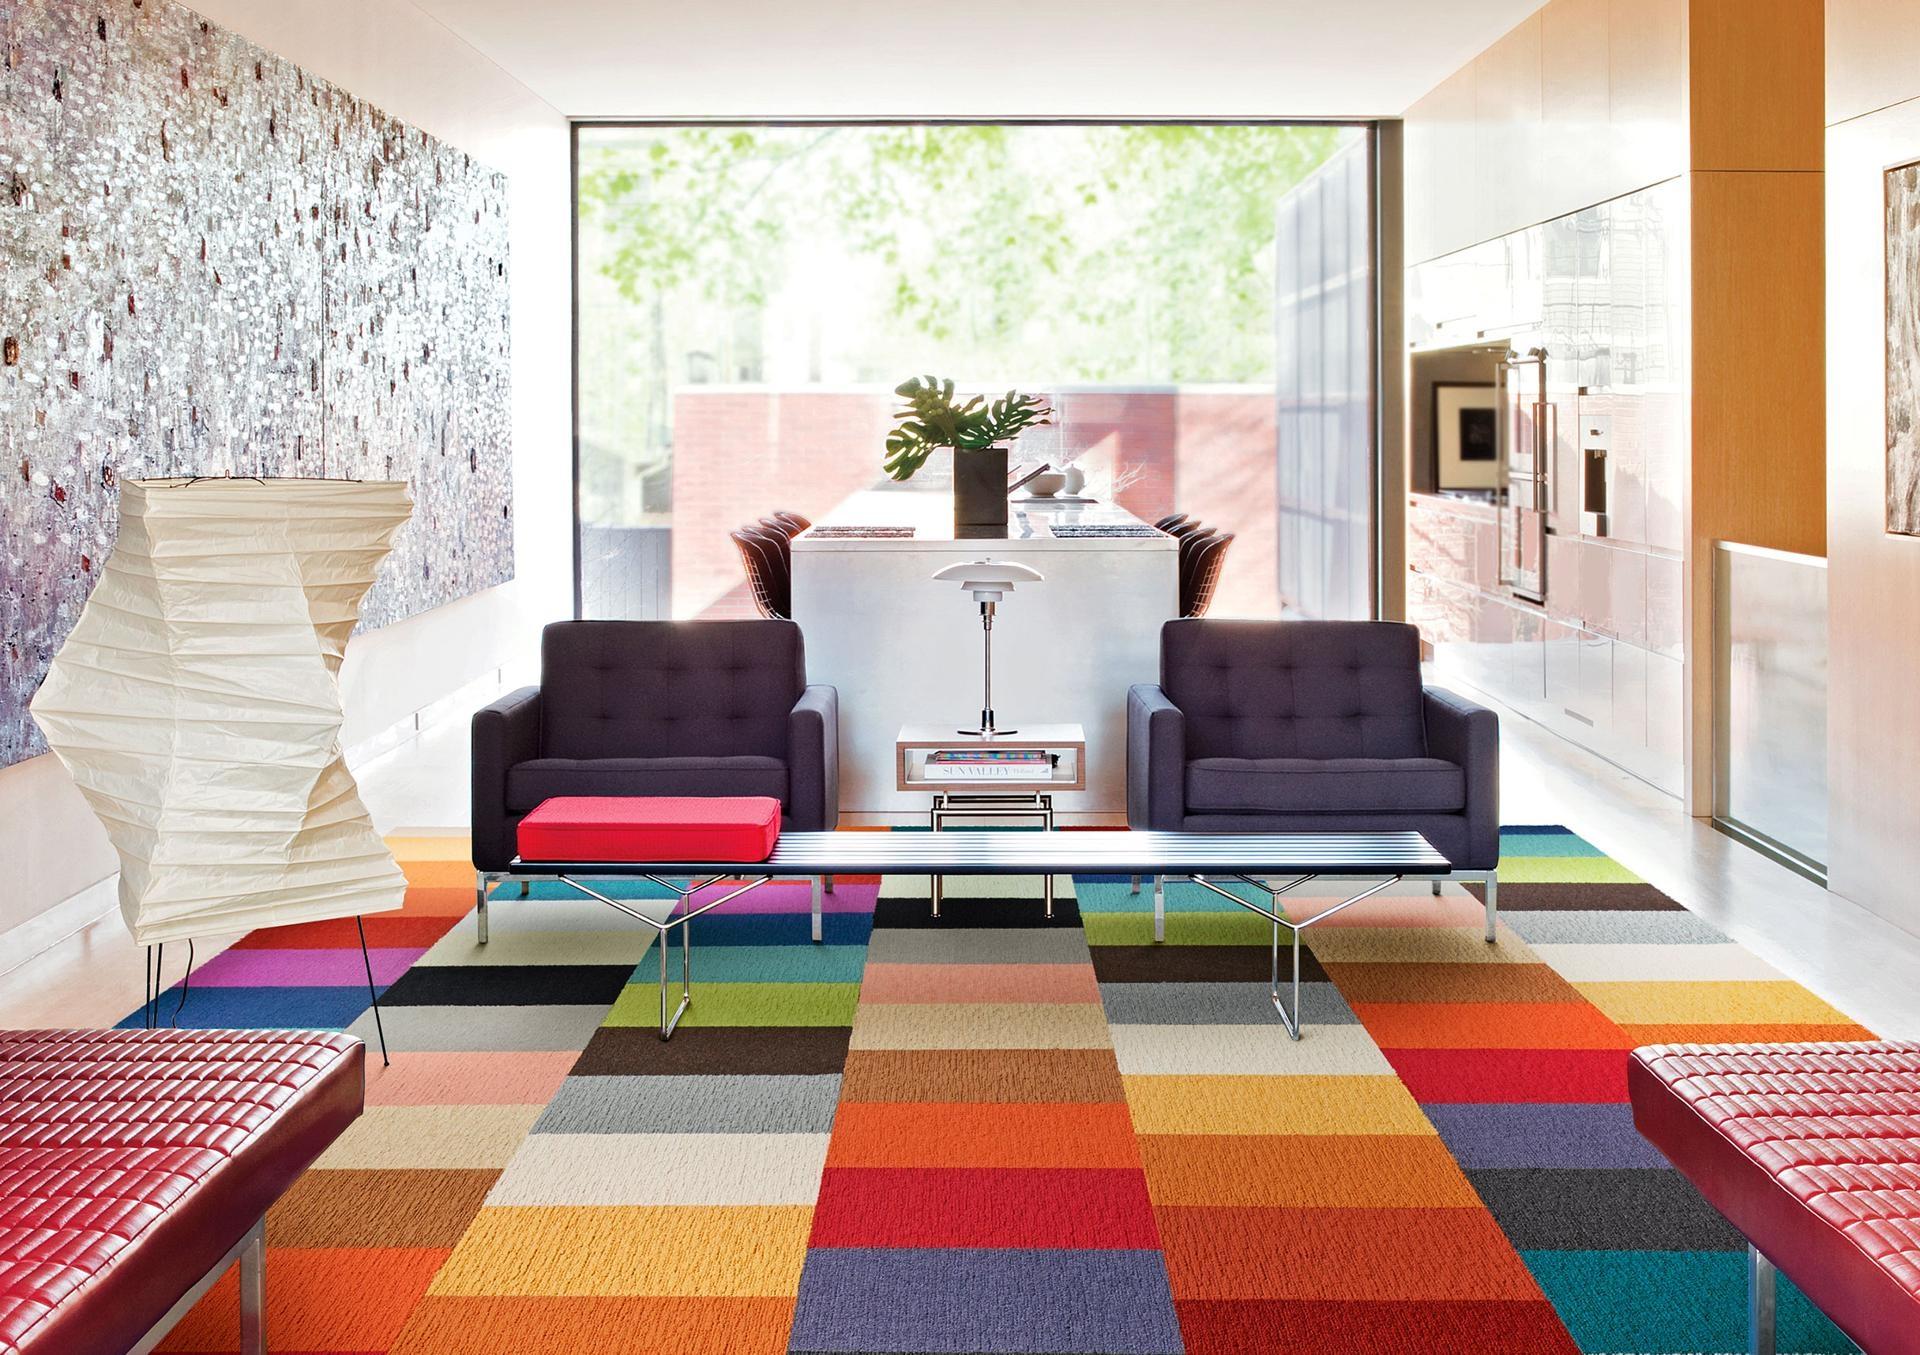 Carpet Tiles For Basement Playroom